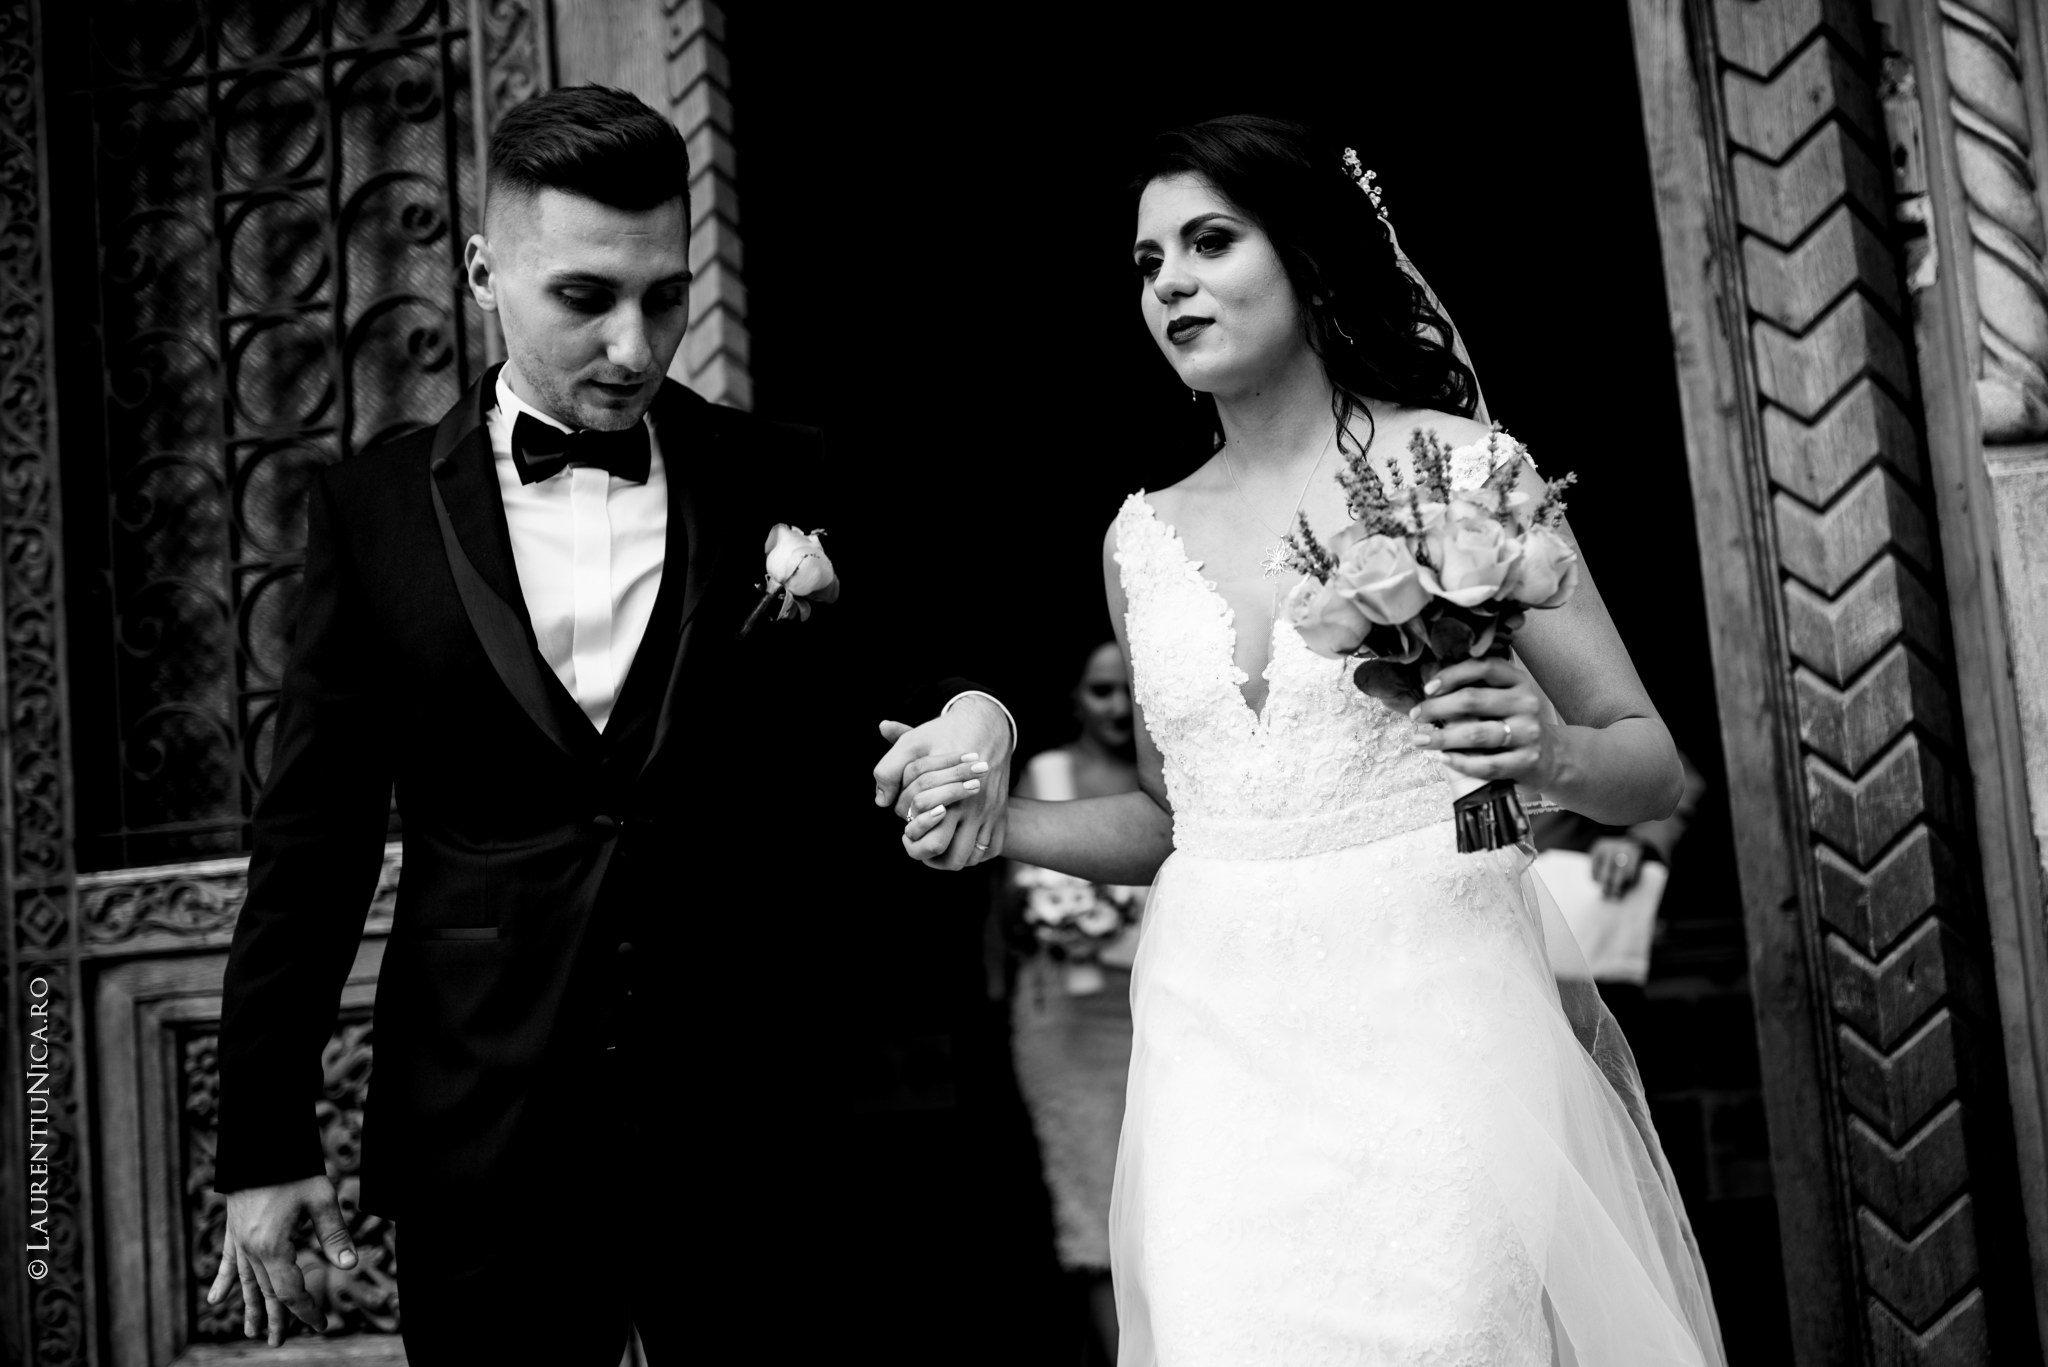 fotografii nunta craiova bia alex fotograf nunta laurentiu nica 38 - Bia & Alex | Fotografii nunta | Craiova